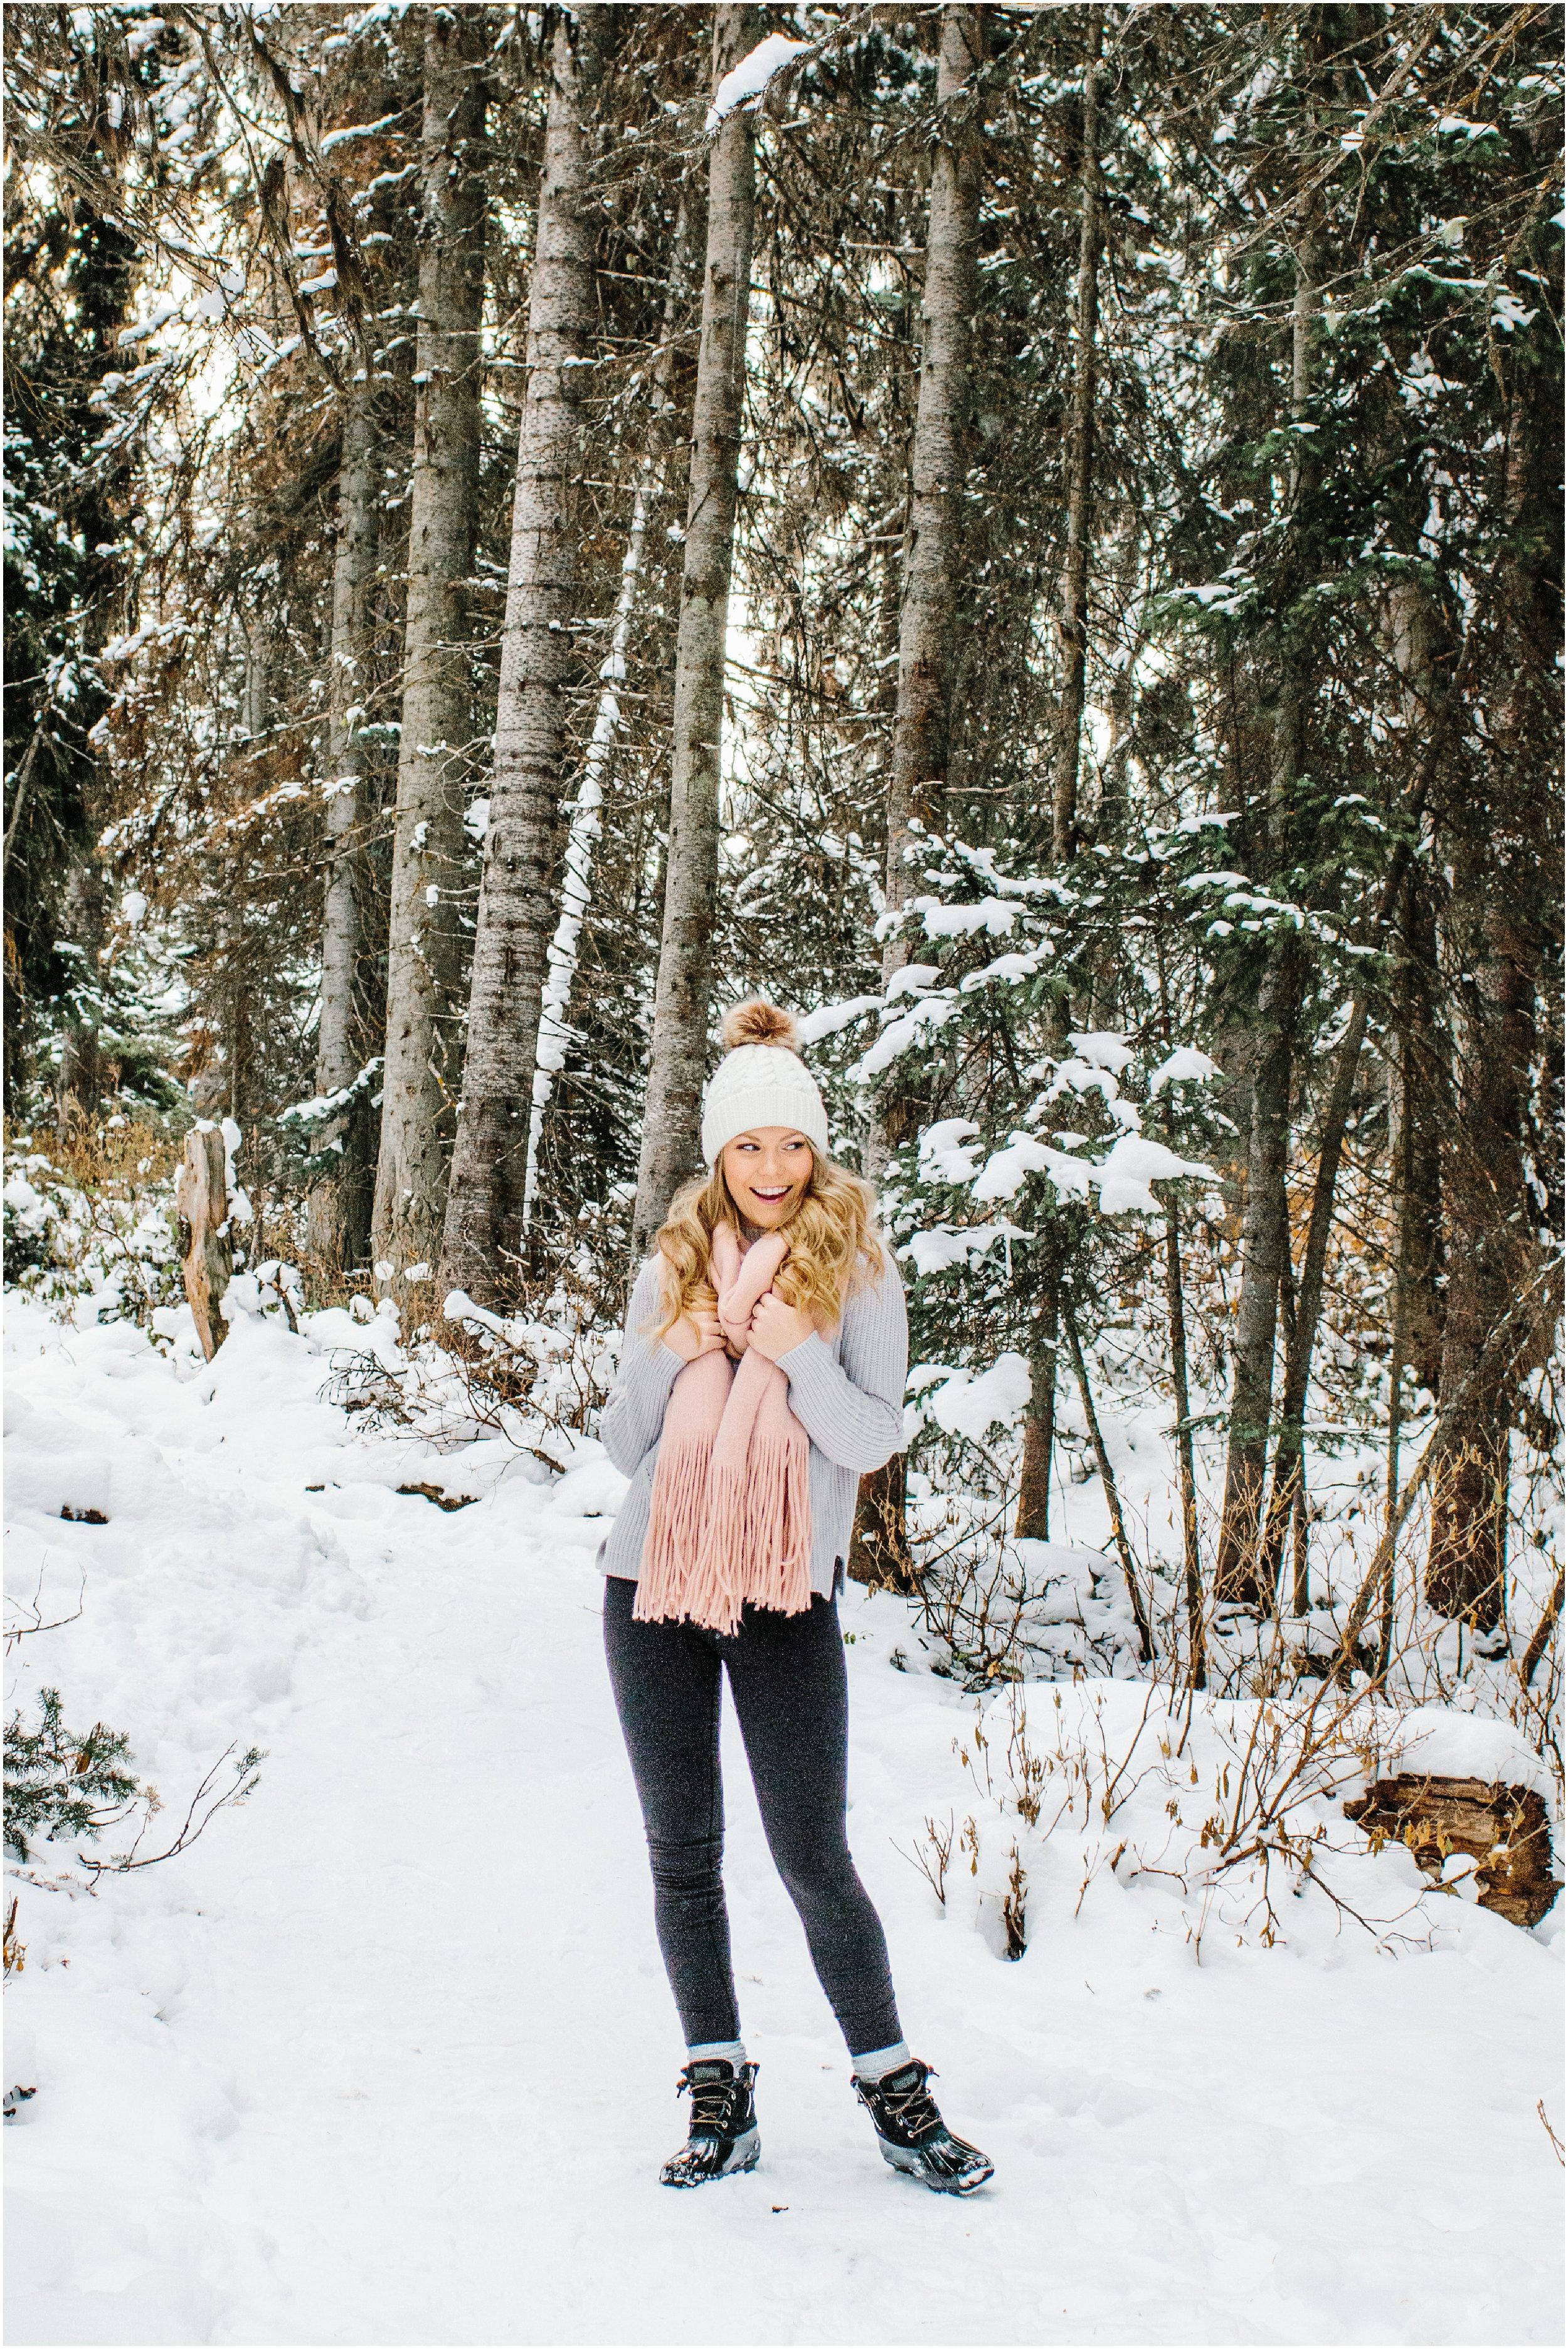 Banff_Travel_Photographer-49.jpg